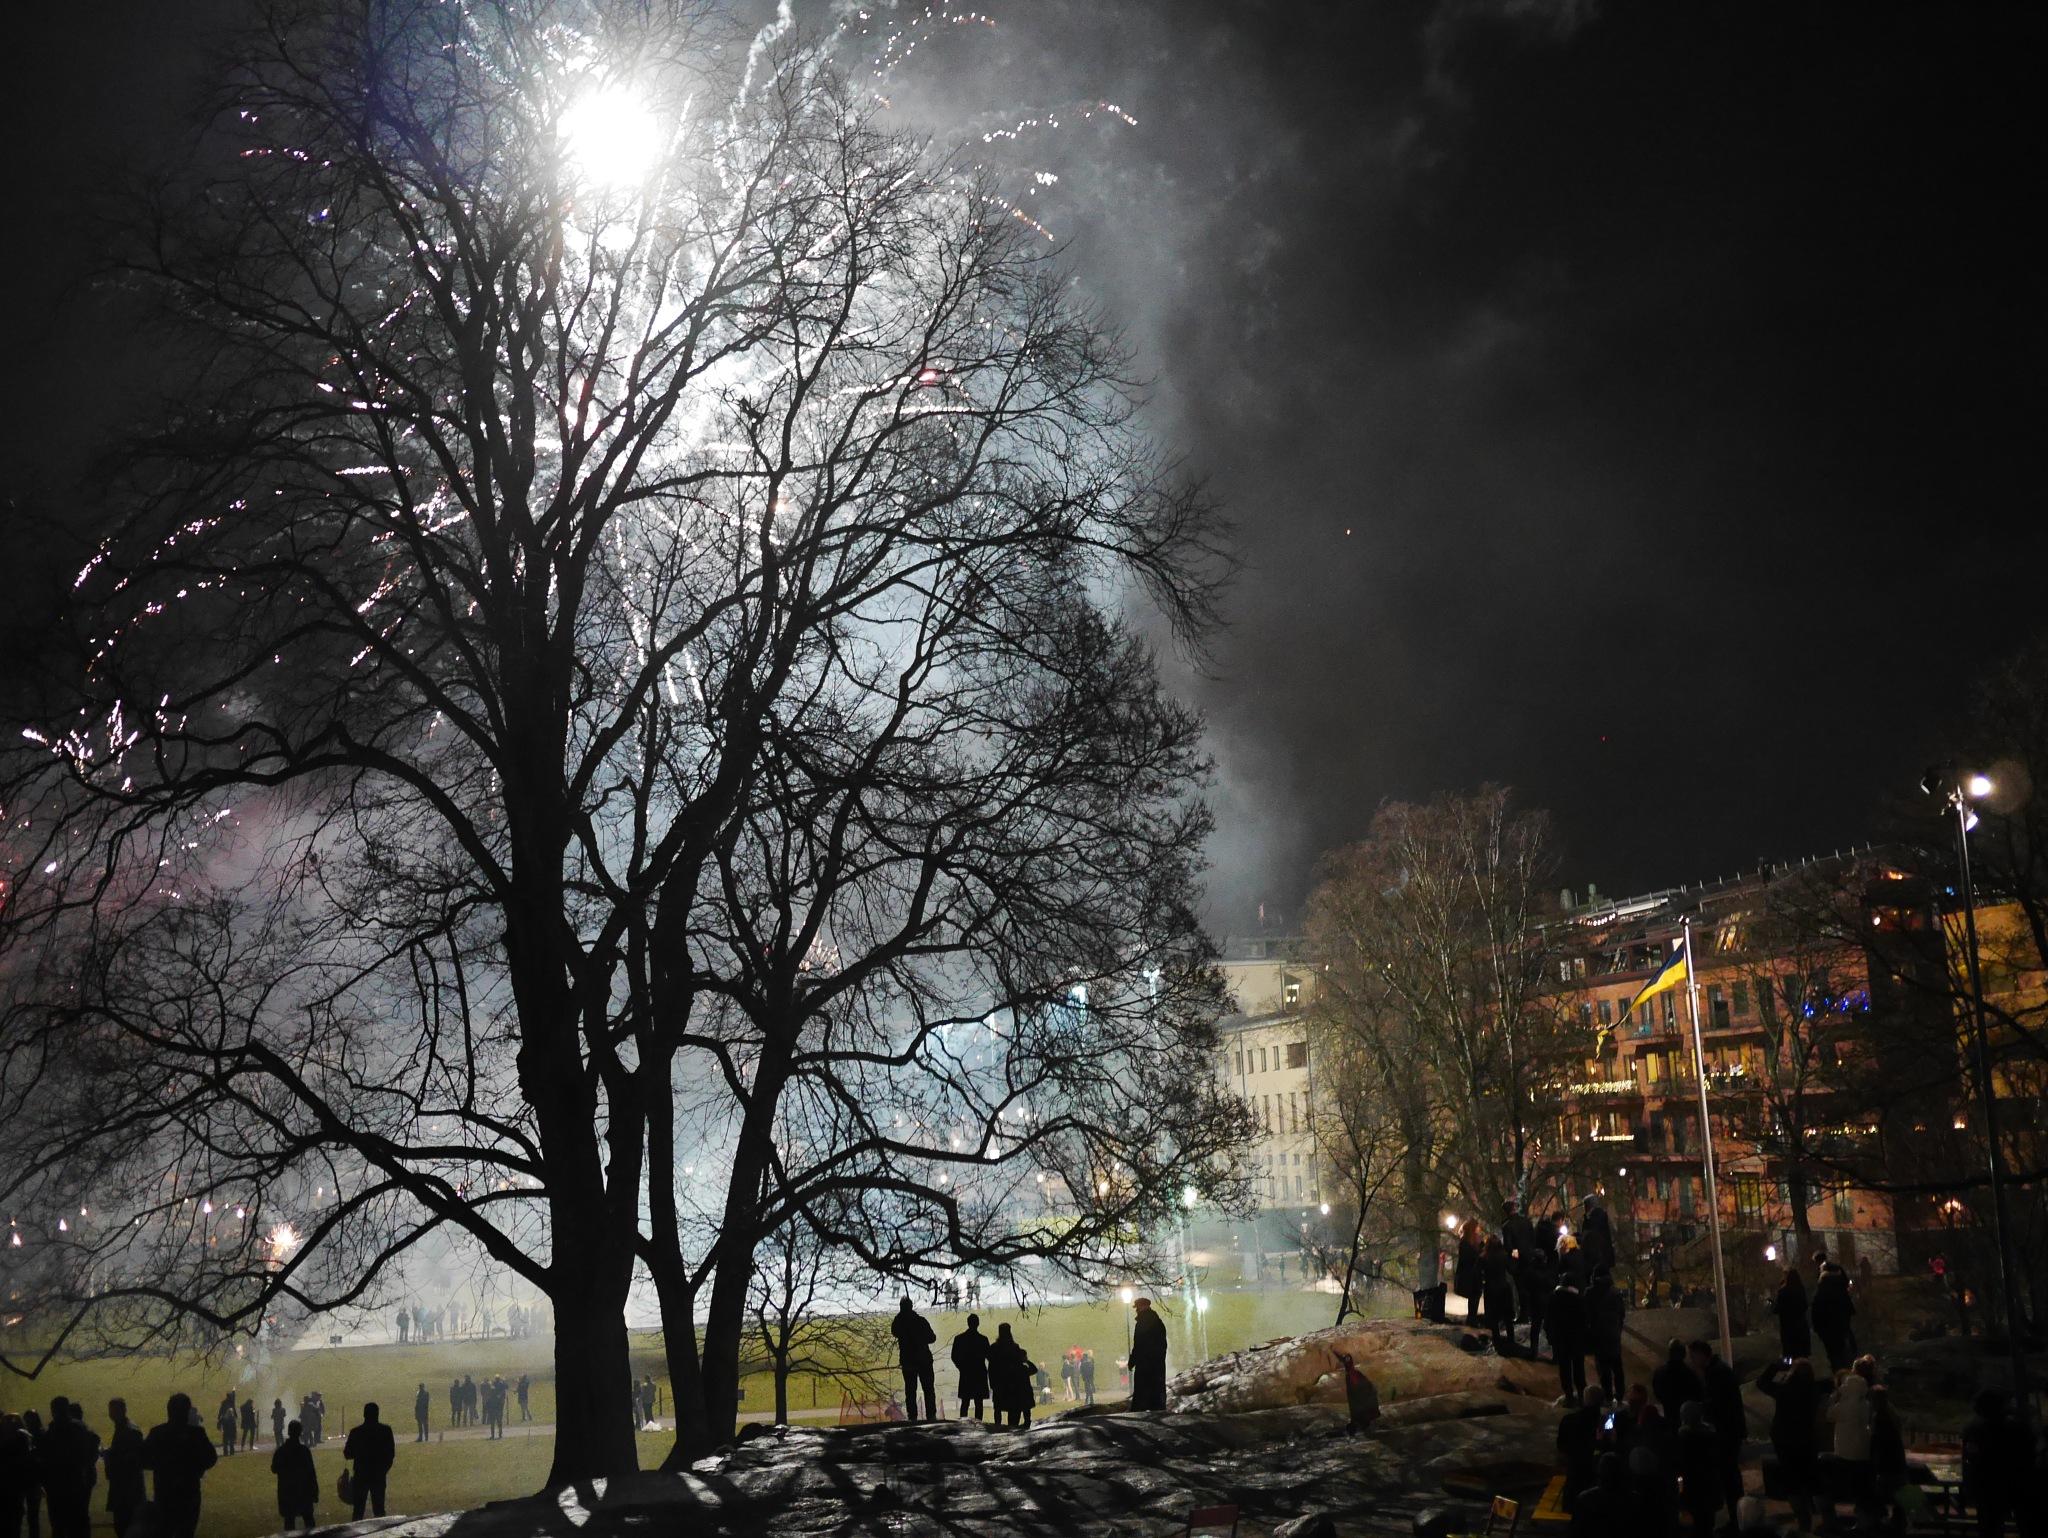 New Years celebration Stockholm city by pi olsson